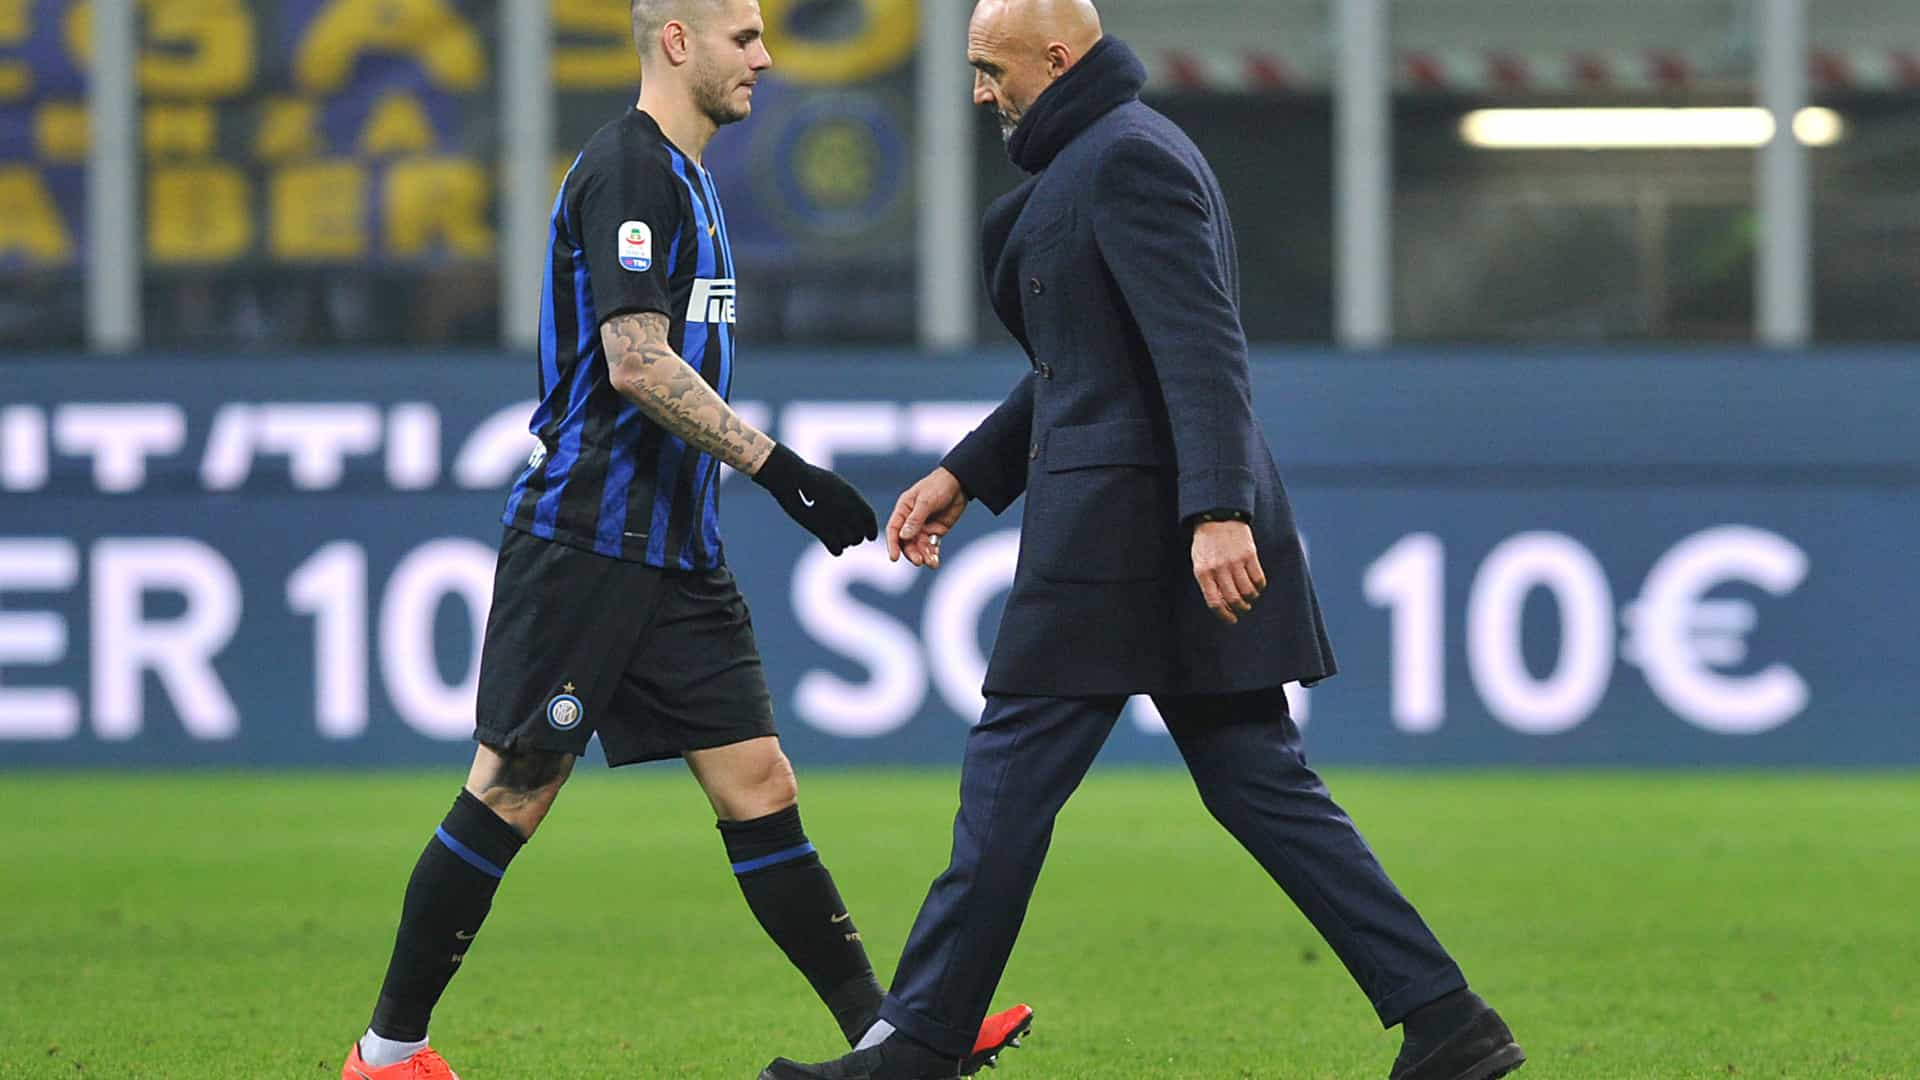 Sarilhos no Inter: Spalletti convoca Icardi, mas atleta recusa ir a Viena